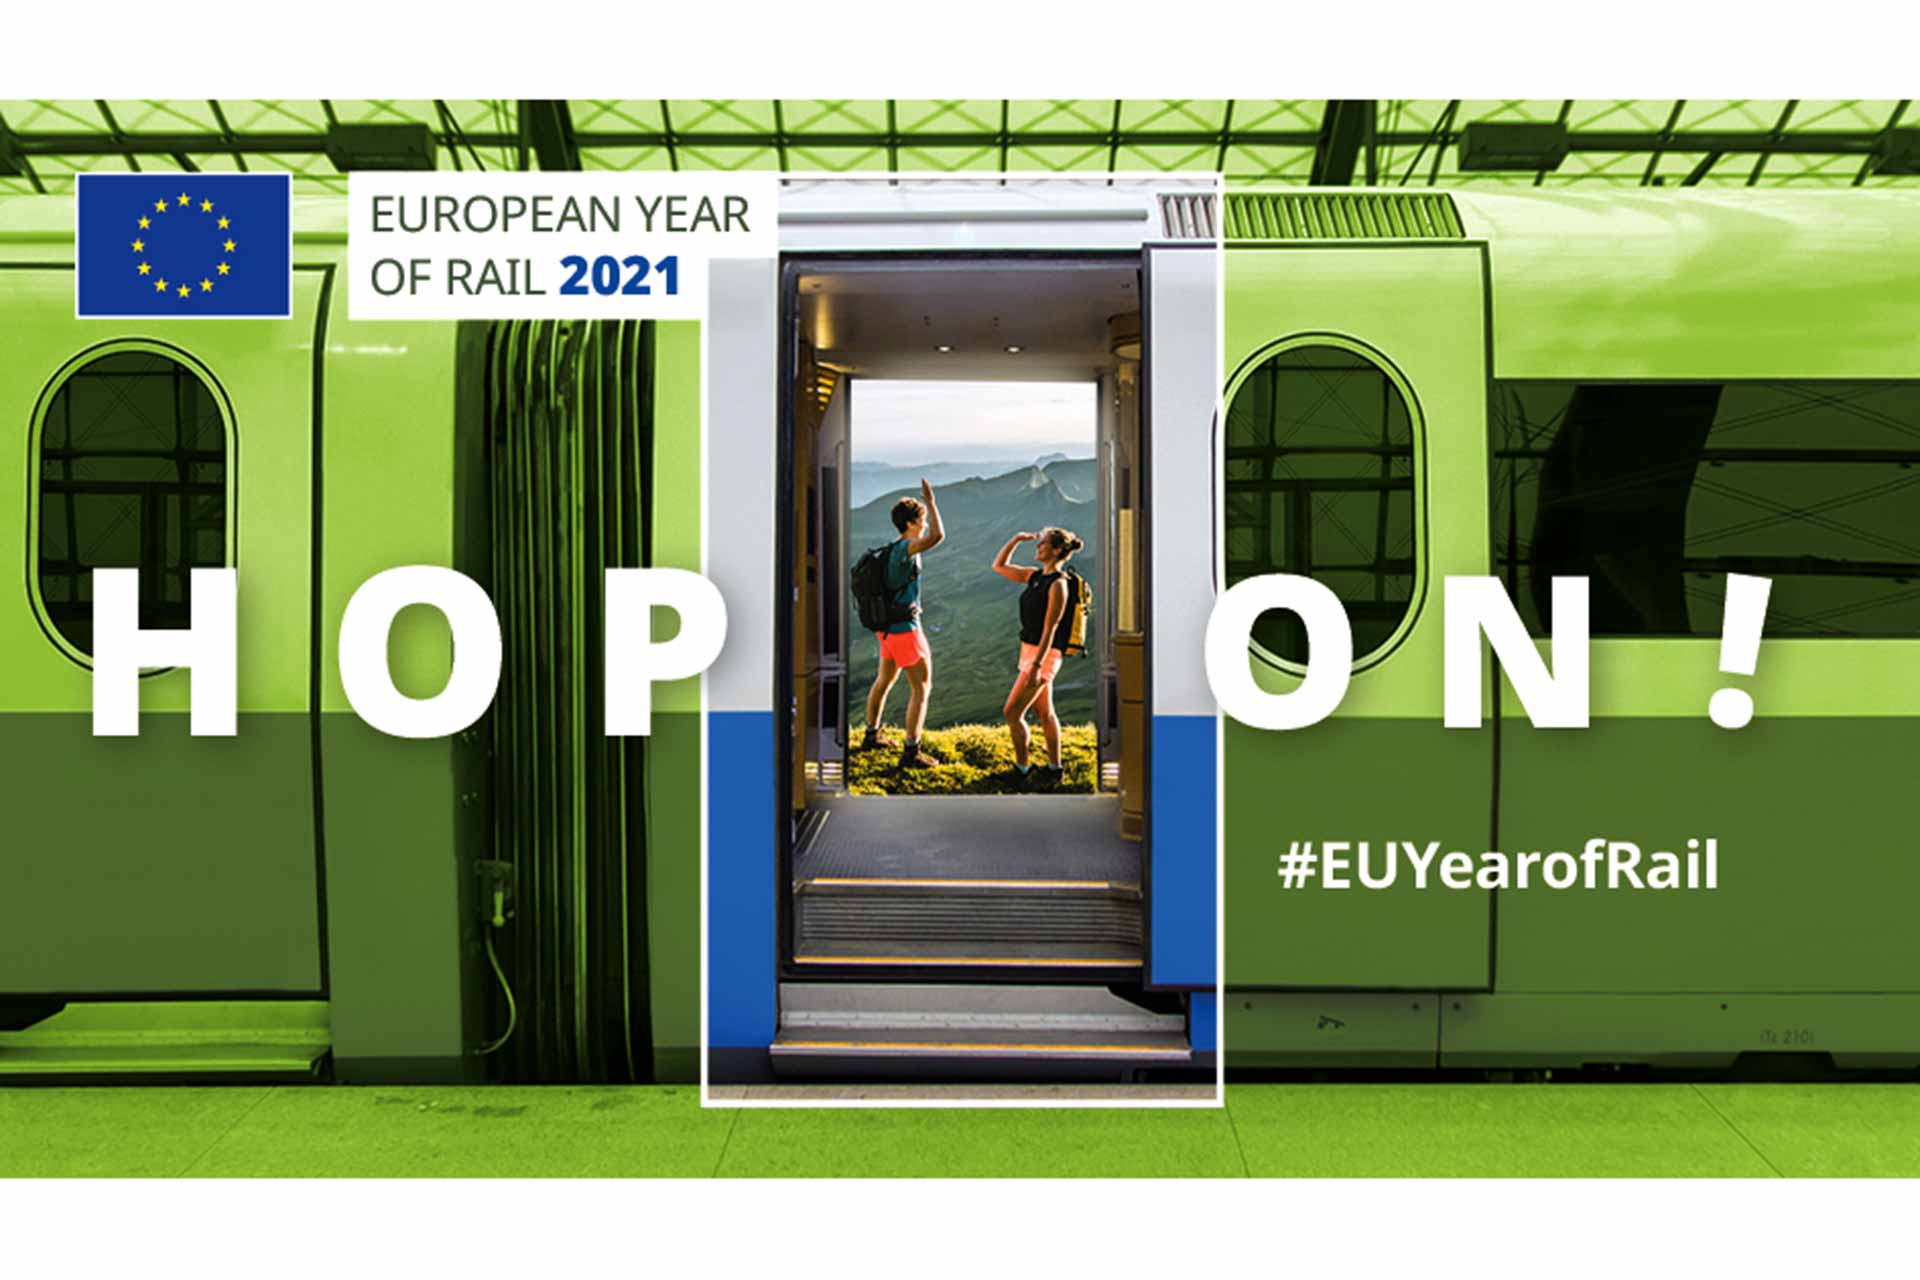 European Year of Rail 2021 #EUYearofRail